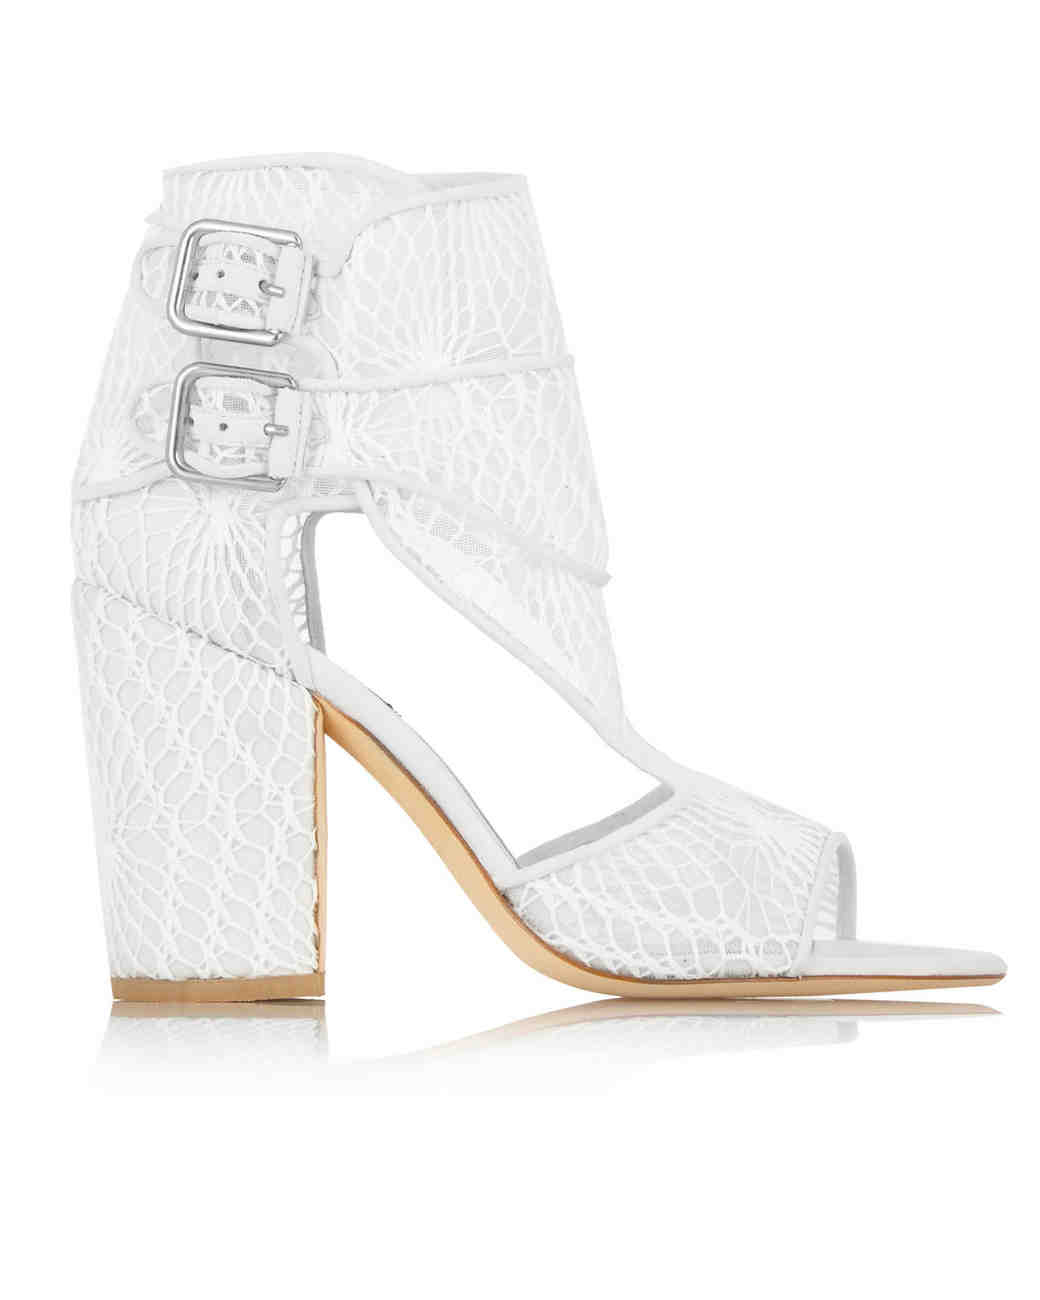 summer-wedding-shoes-laurence-dacade-macrame-sandals-0515.jpg